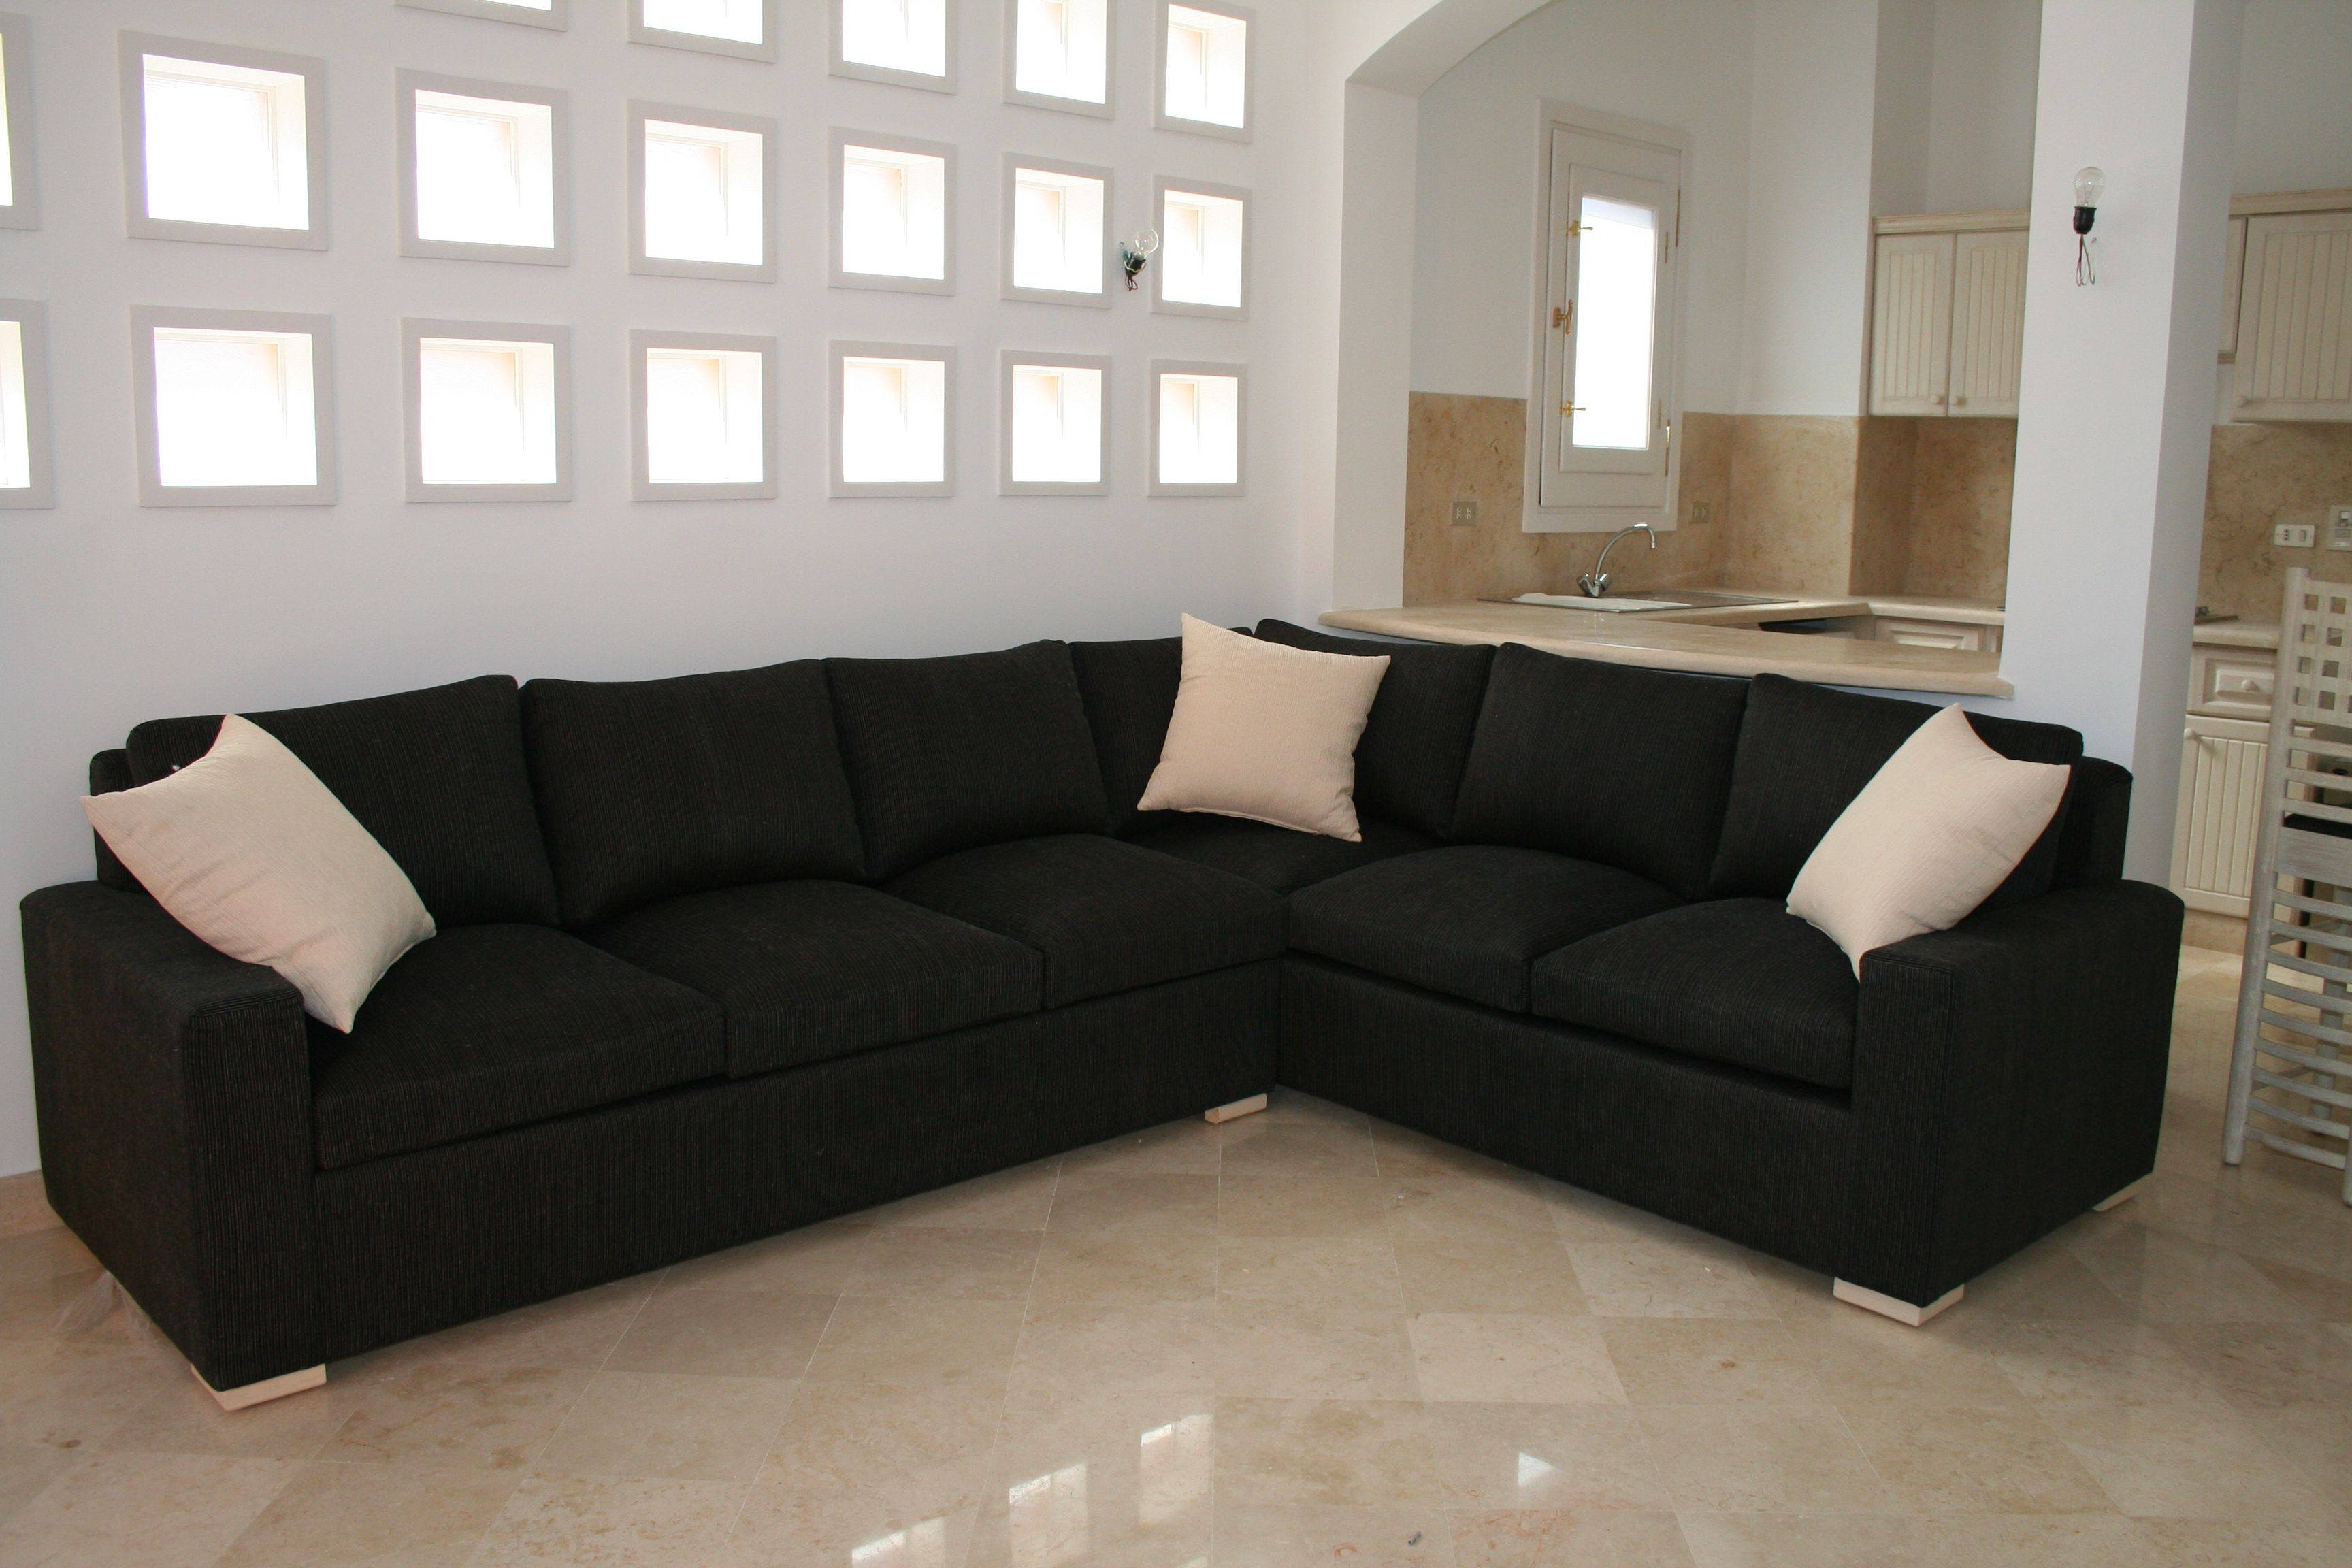 Sofa : Modern Sofas Houston Interior Design For Home Remodeling with regard to Modern Sofas Houston (Image 16 of 30)